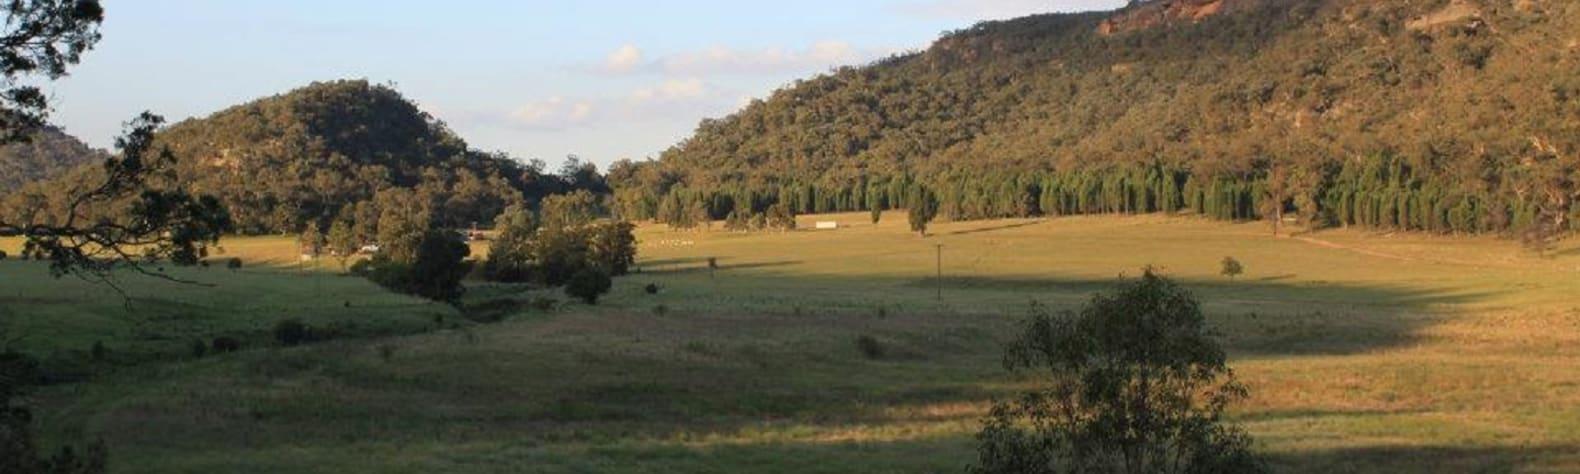 Valley View Farm, Hunter Valley